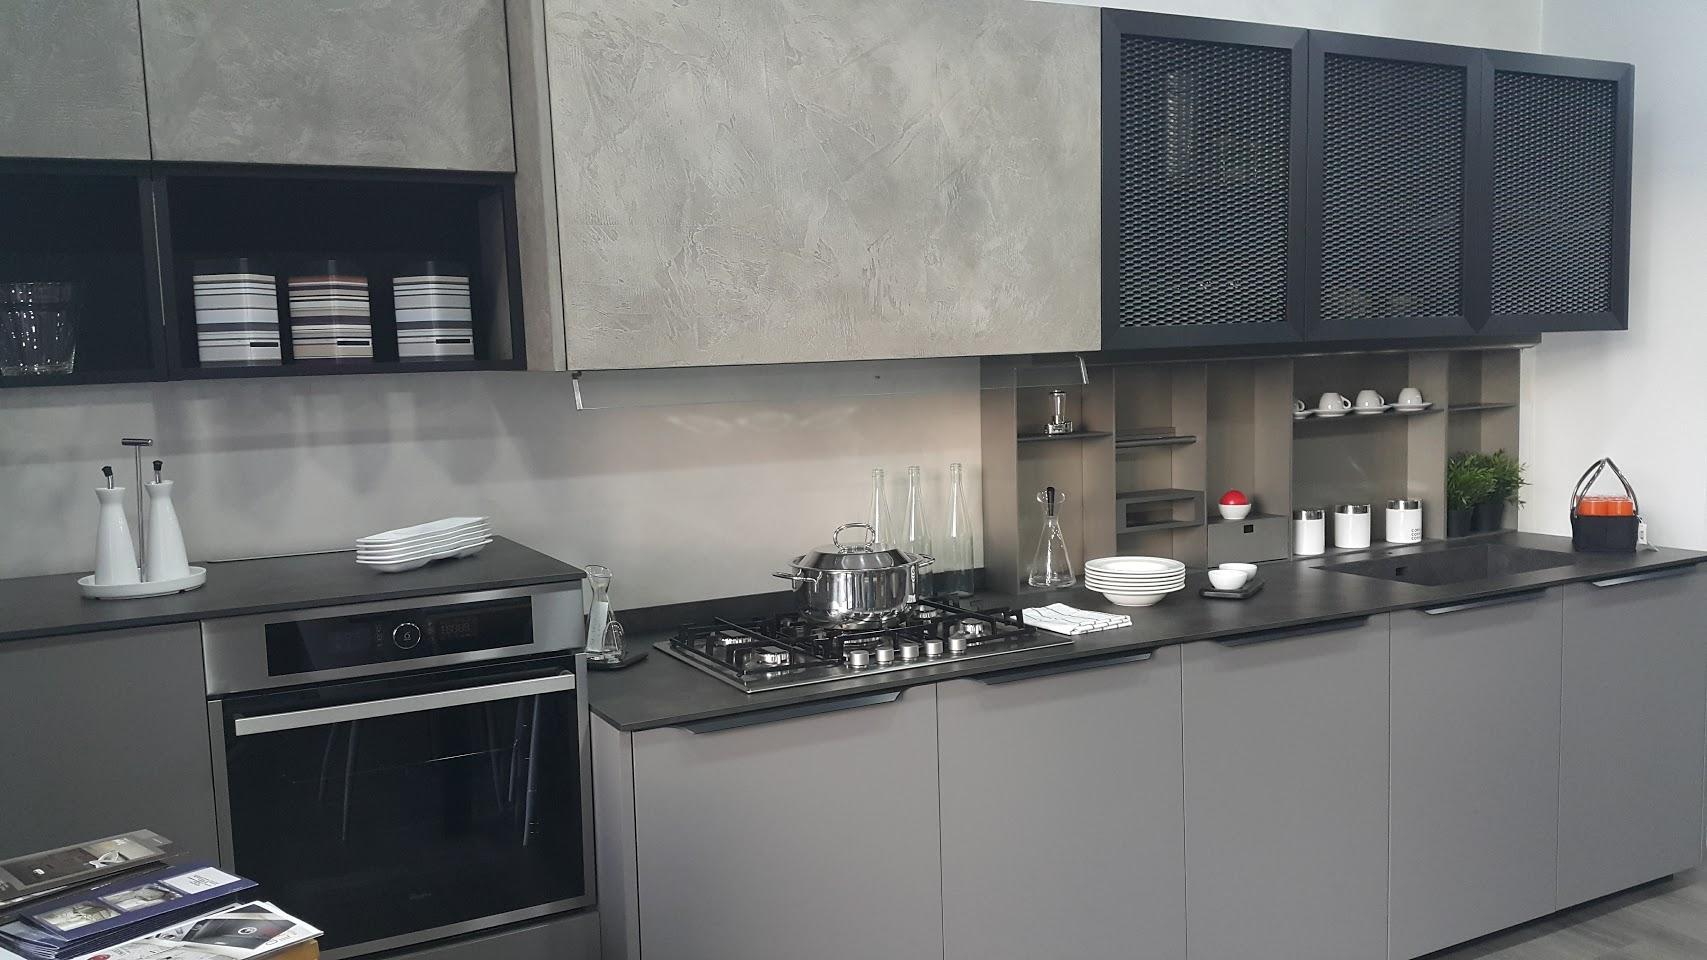 Cucina lube cucine oltre industriale cucine a prezzi - Prezzi cucine lube ...